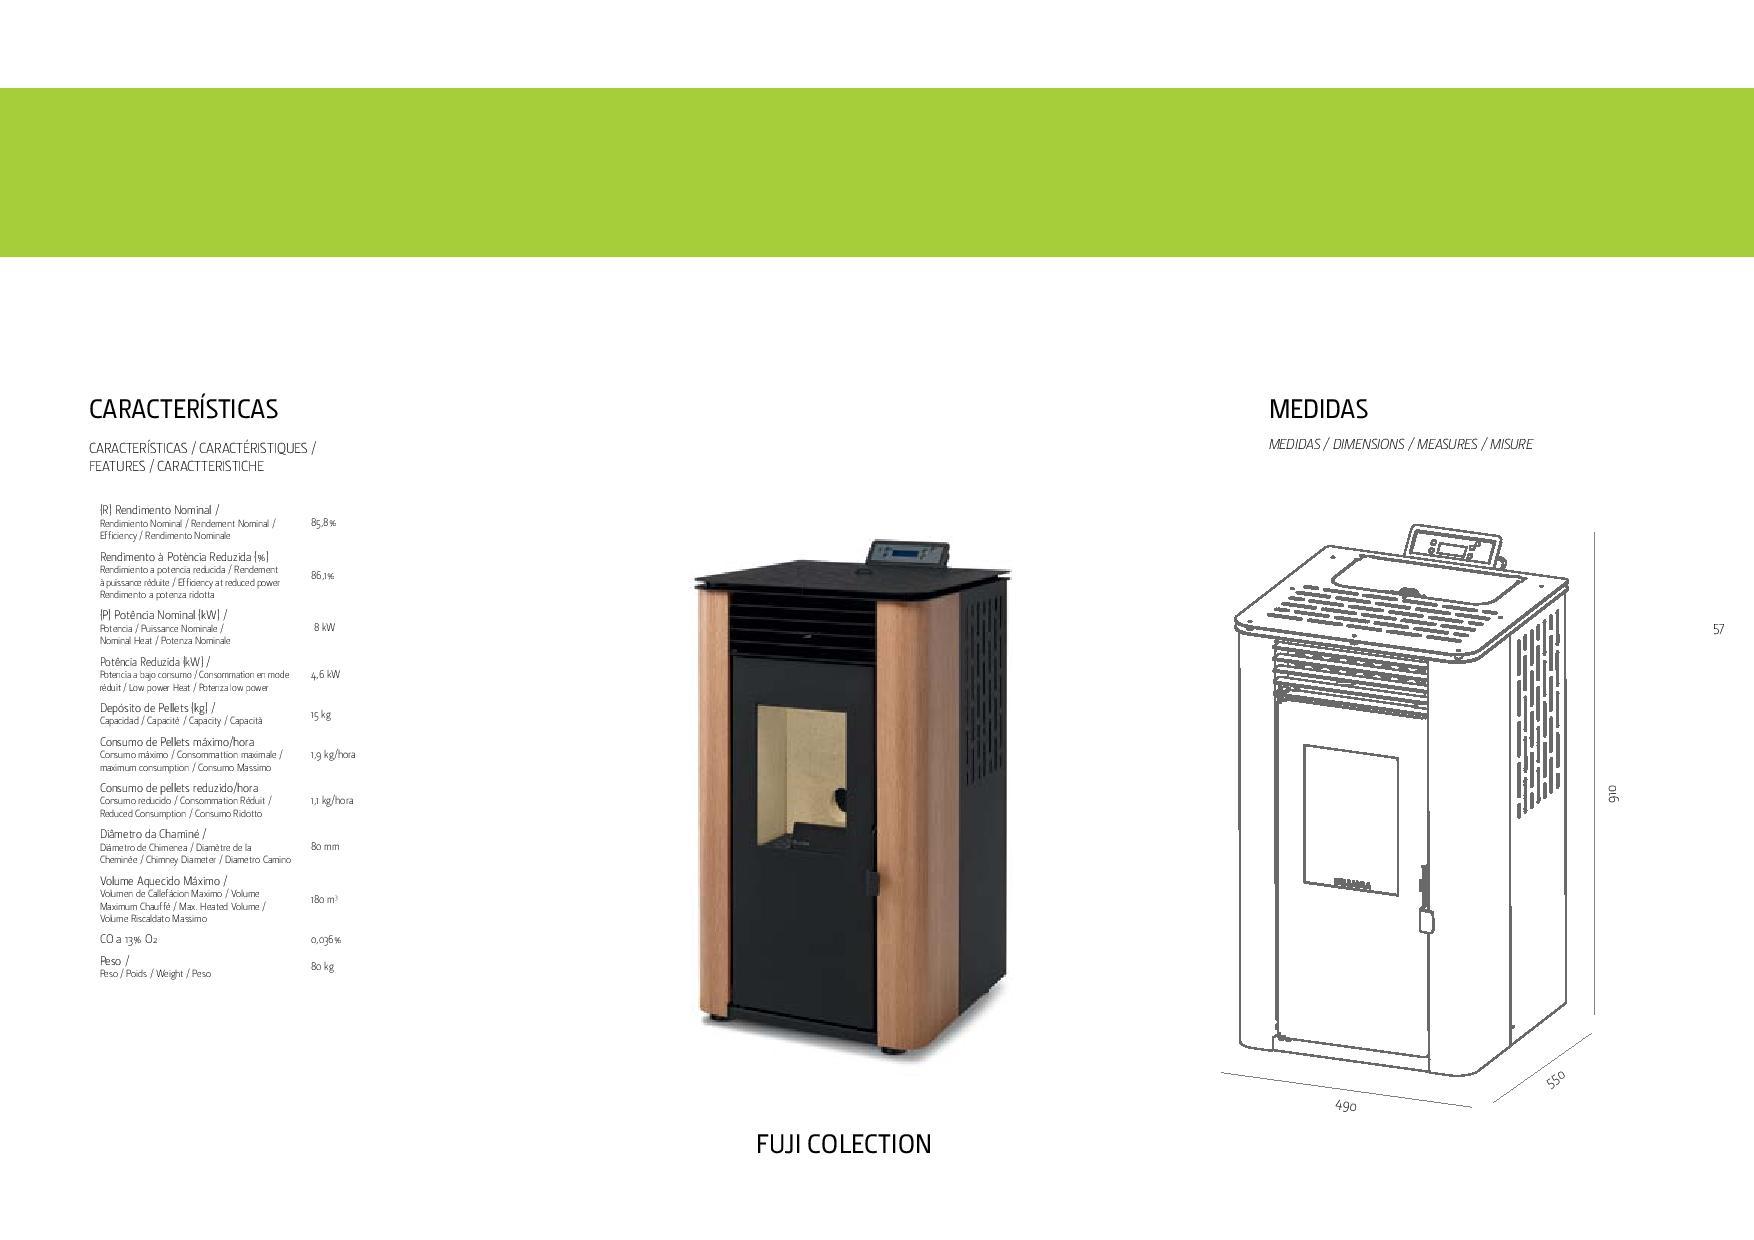 poele a bois toulouse. Black Bedroom Furniture Sets. Home Design Ideas